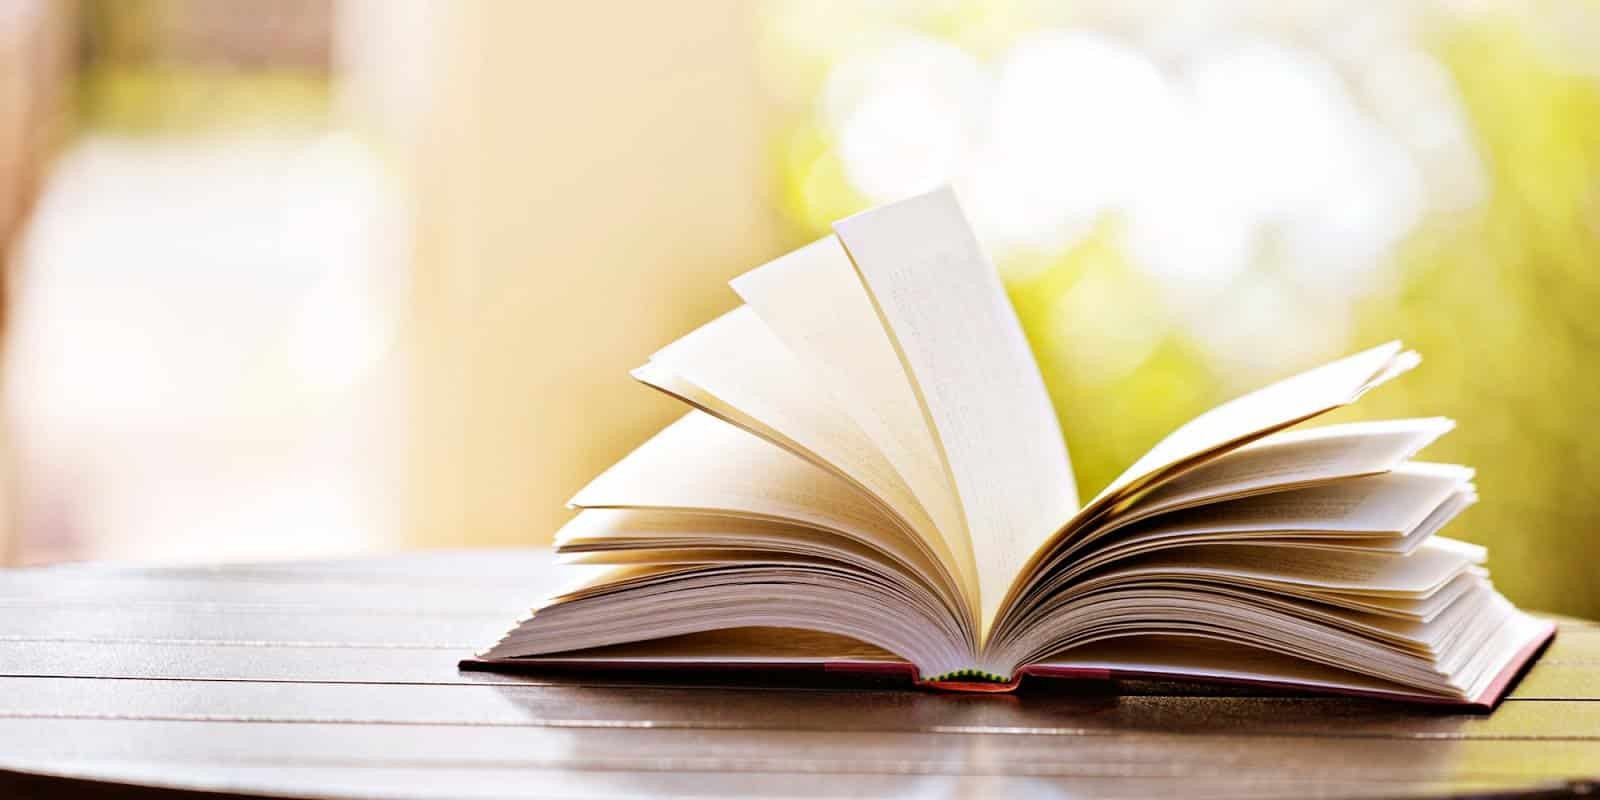 3. Contoh Resensi Buku Pengetahuan